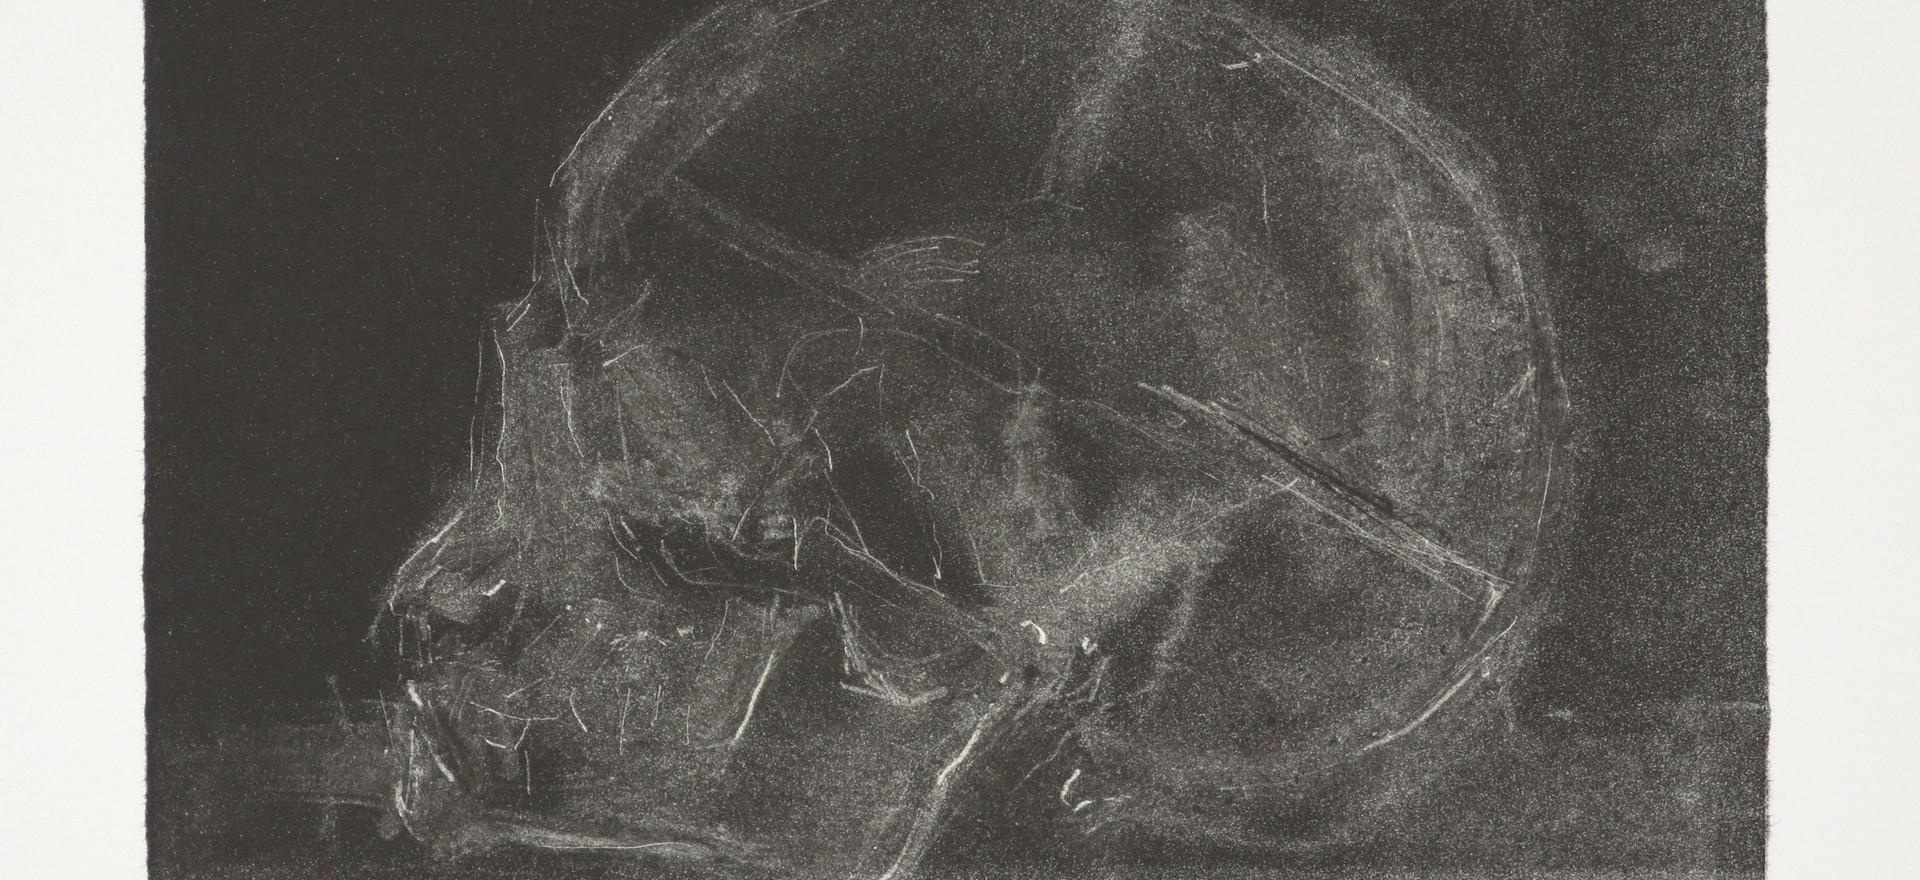 'Orb', 2017, lithograph, 24.2 x 18.4 cm